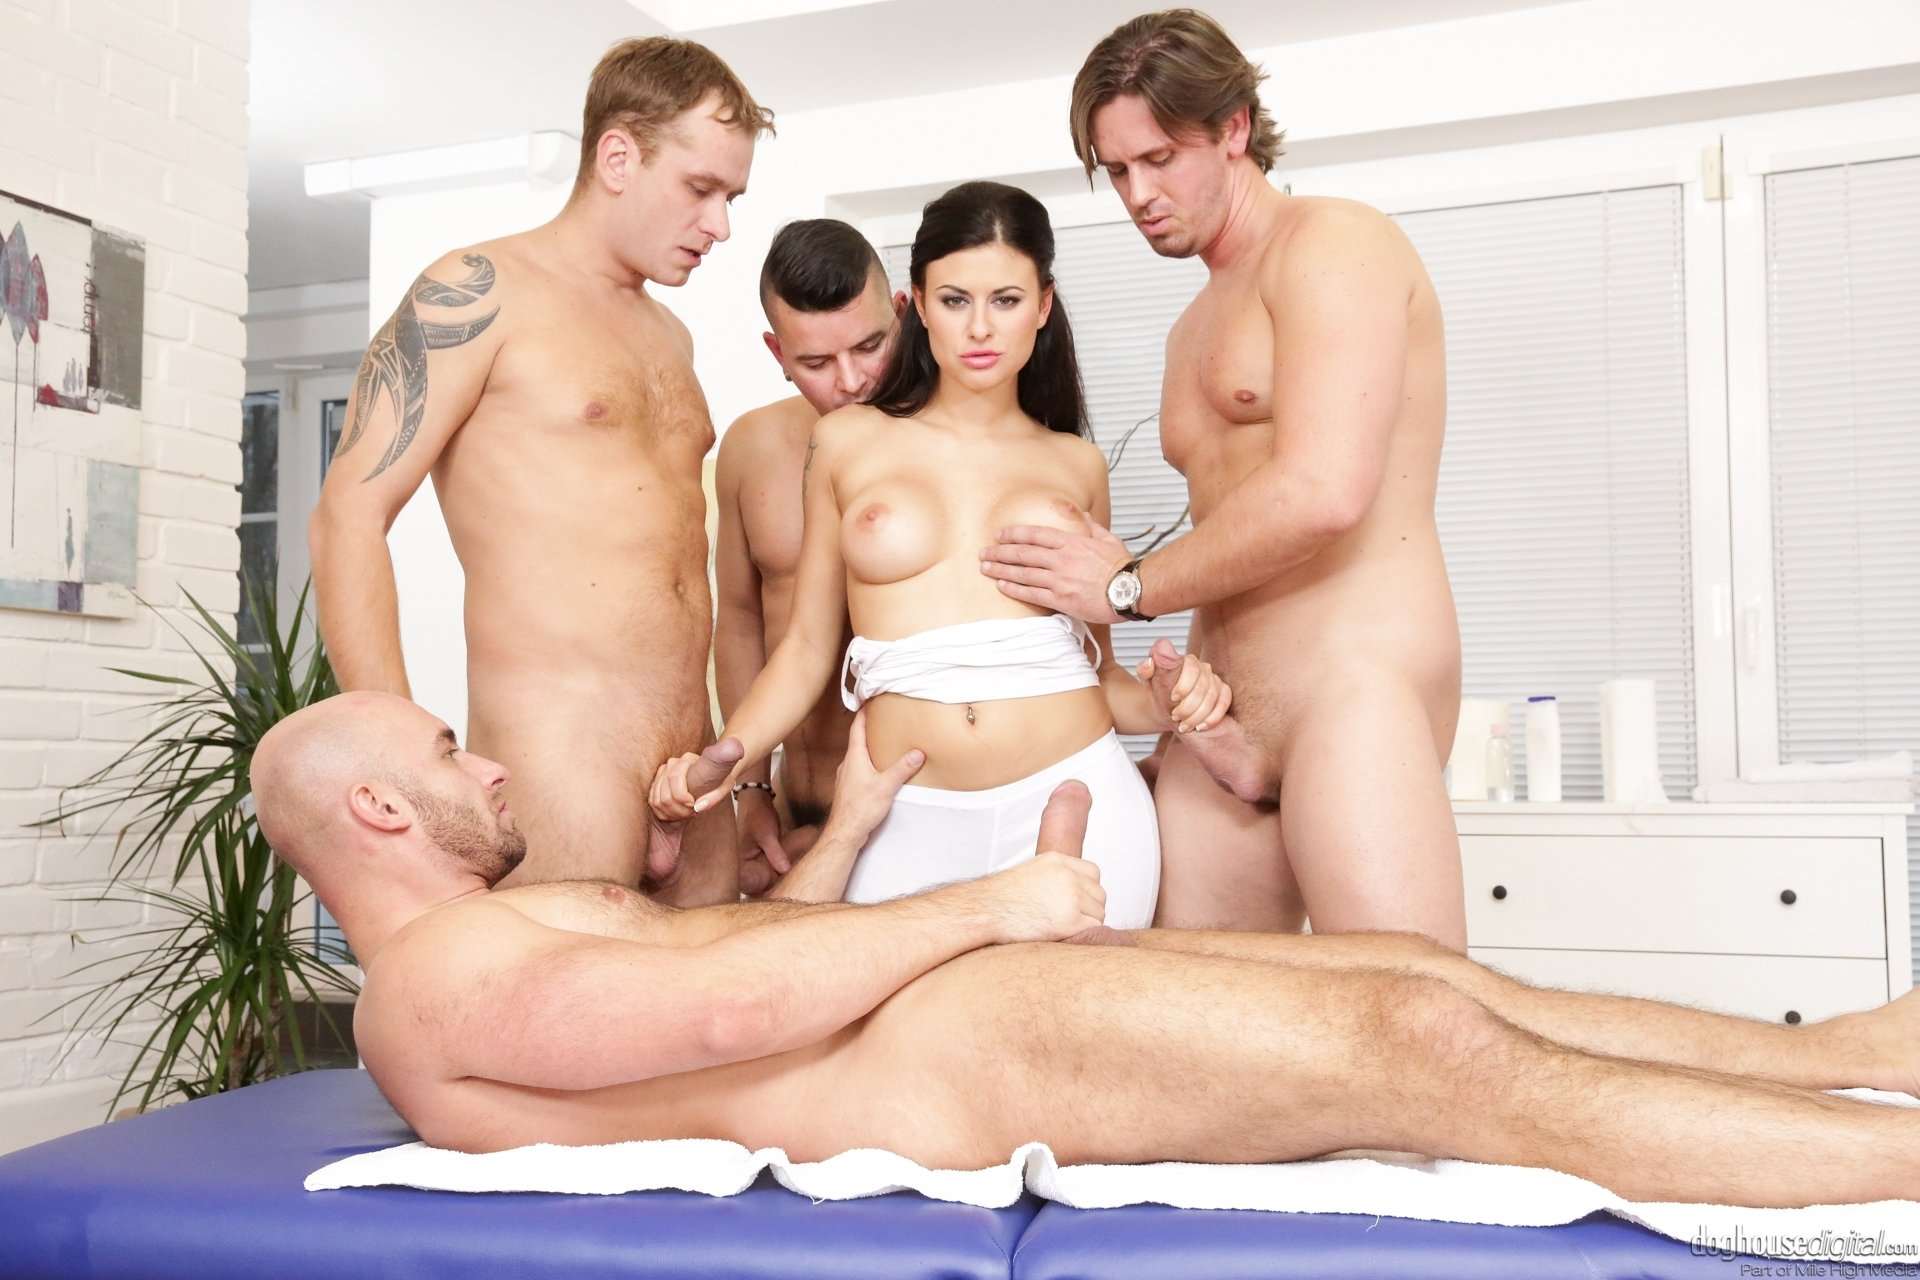 Out Of The Family Sheena Ryder Pretty Pornstar Pornmate Sex Hd Pics